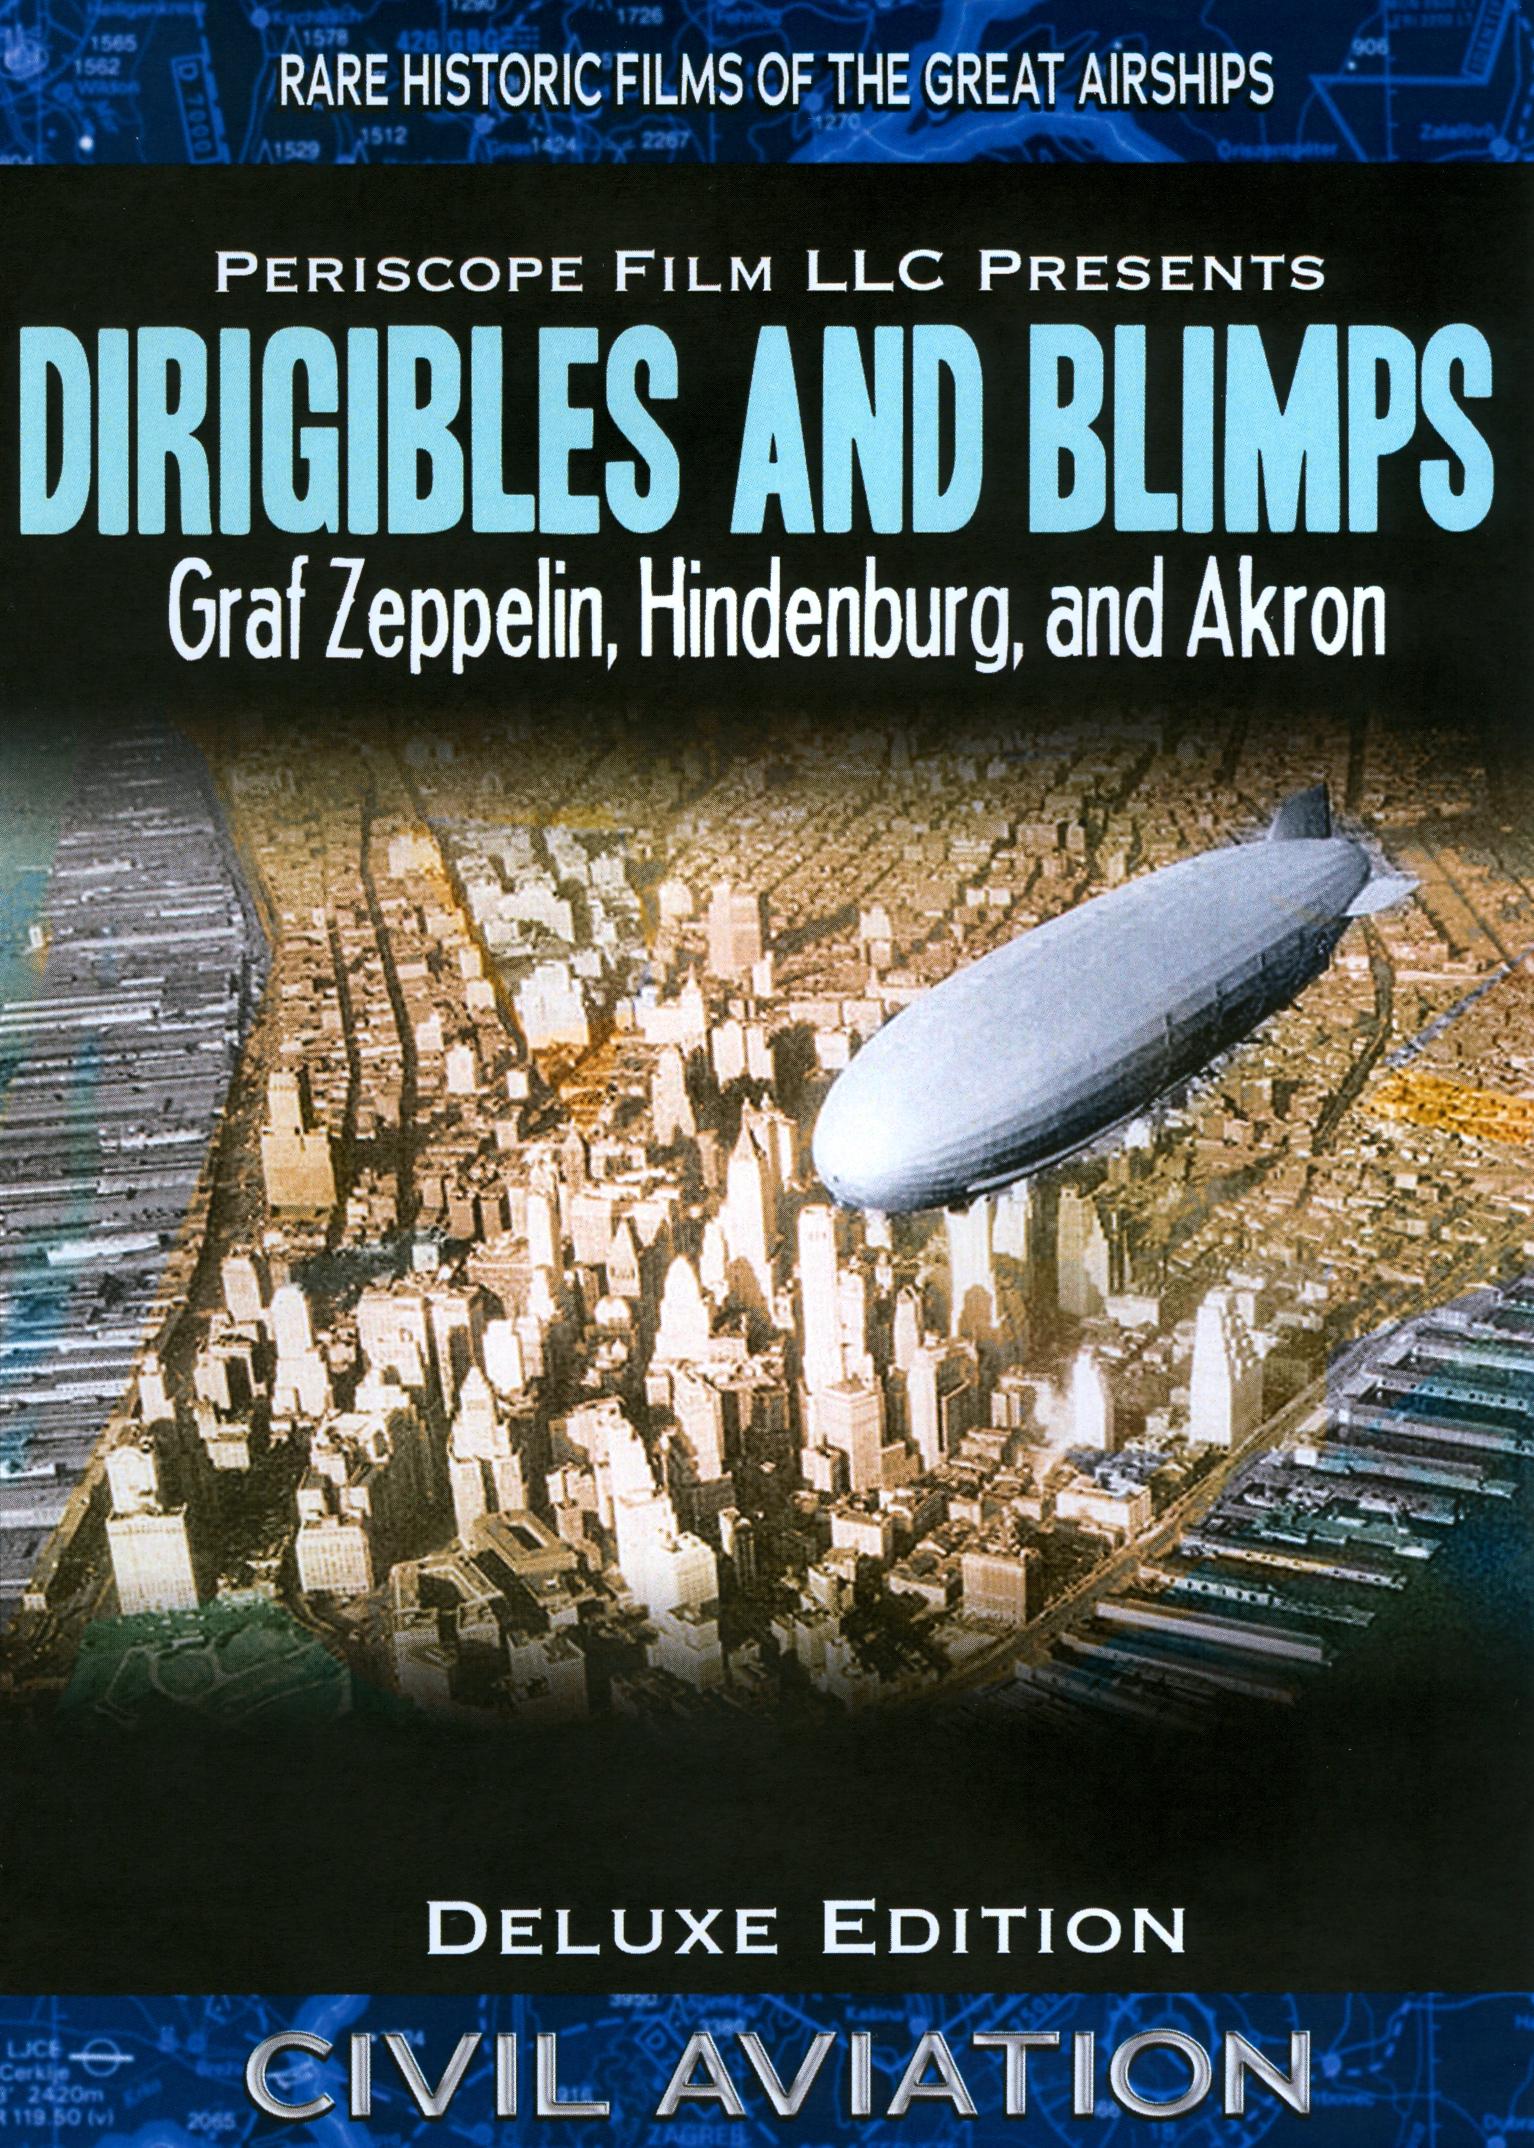 Dirigibles and Blimps